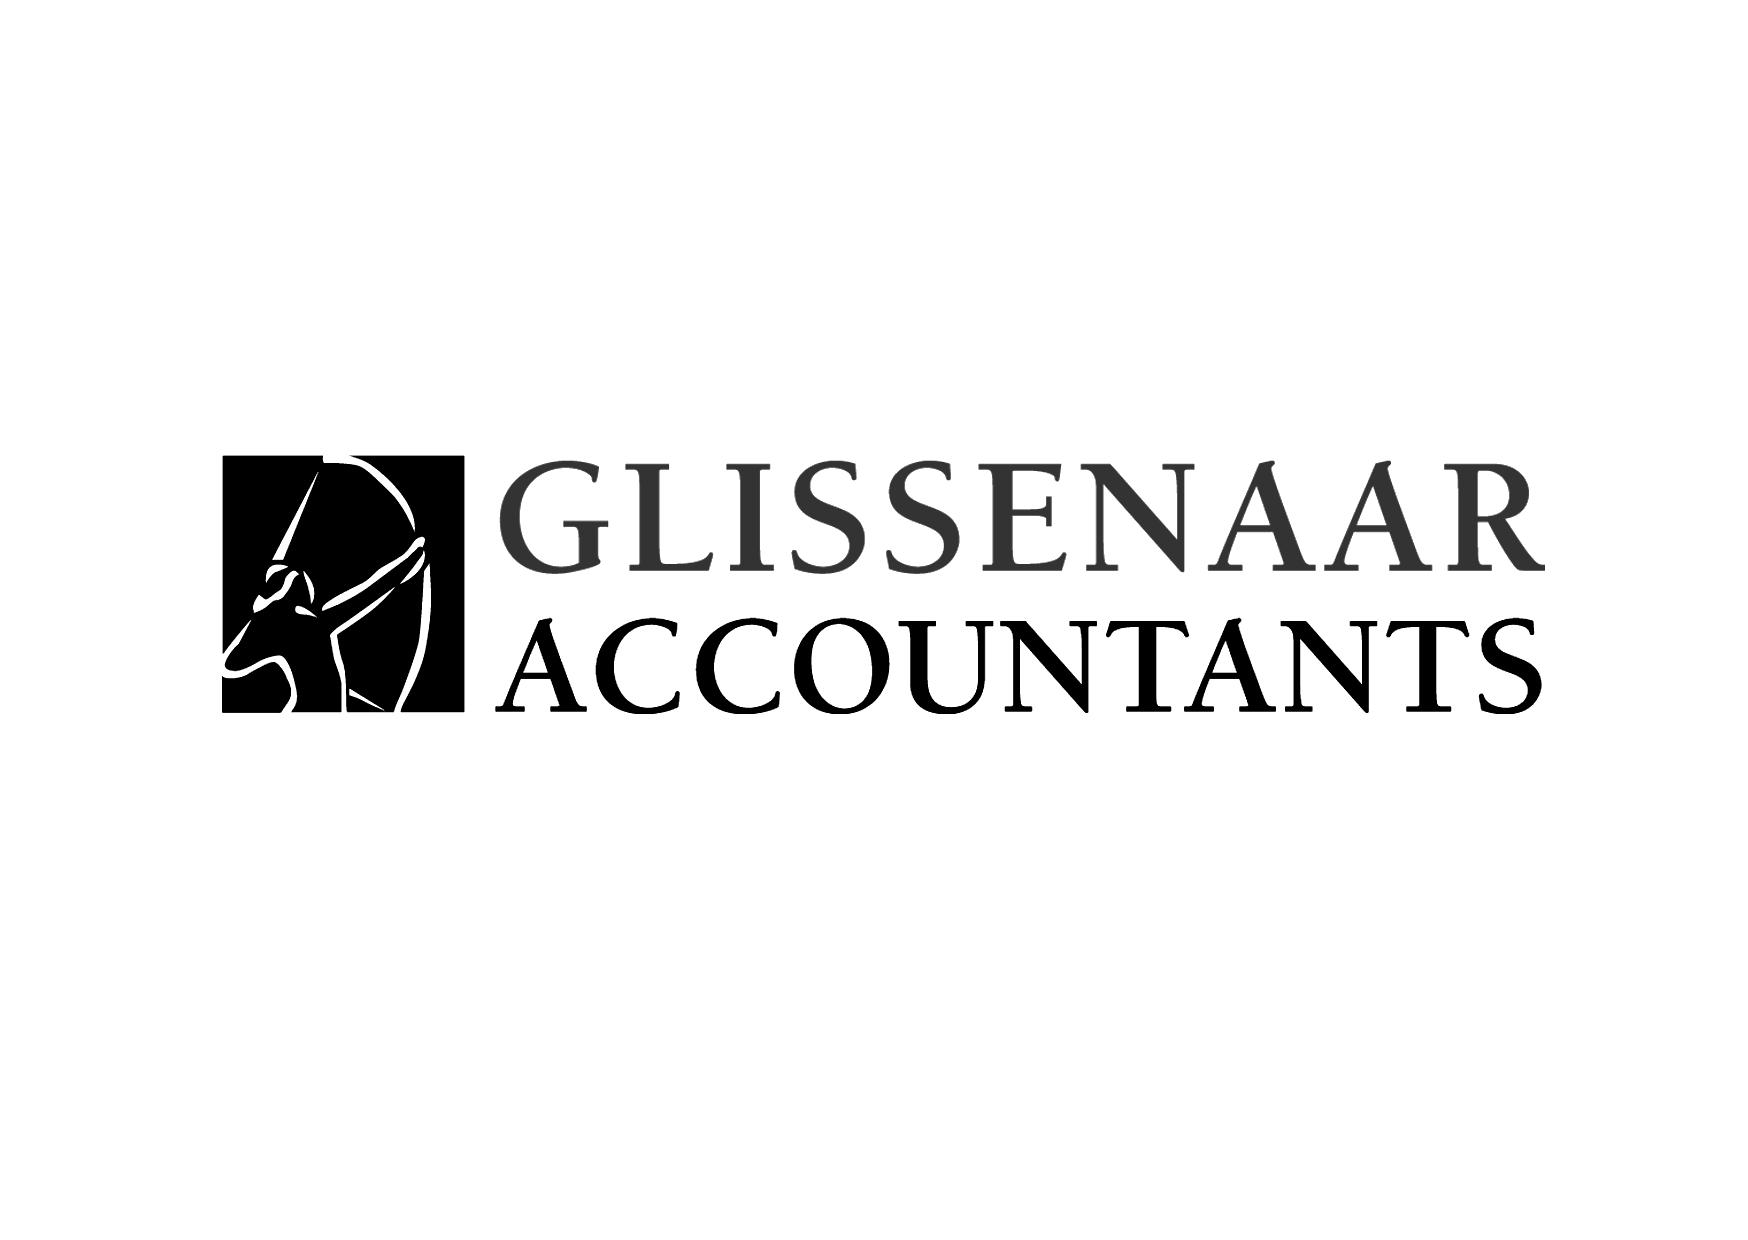 logo Glissenaar